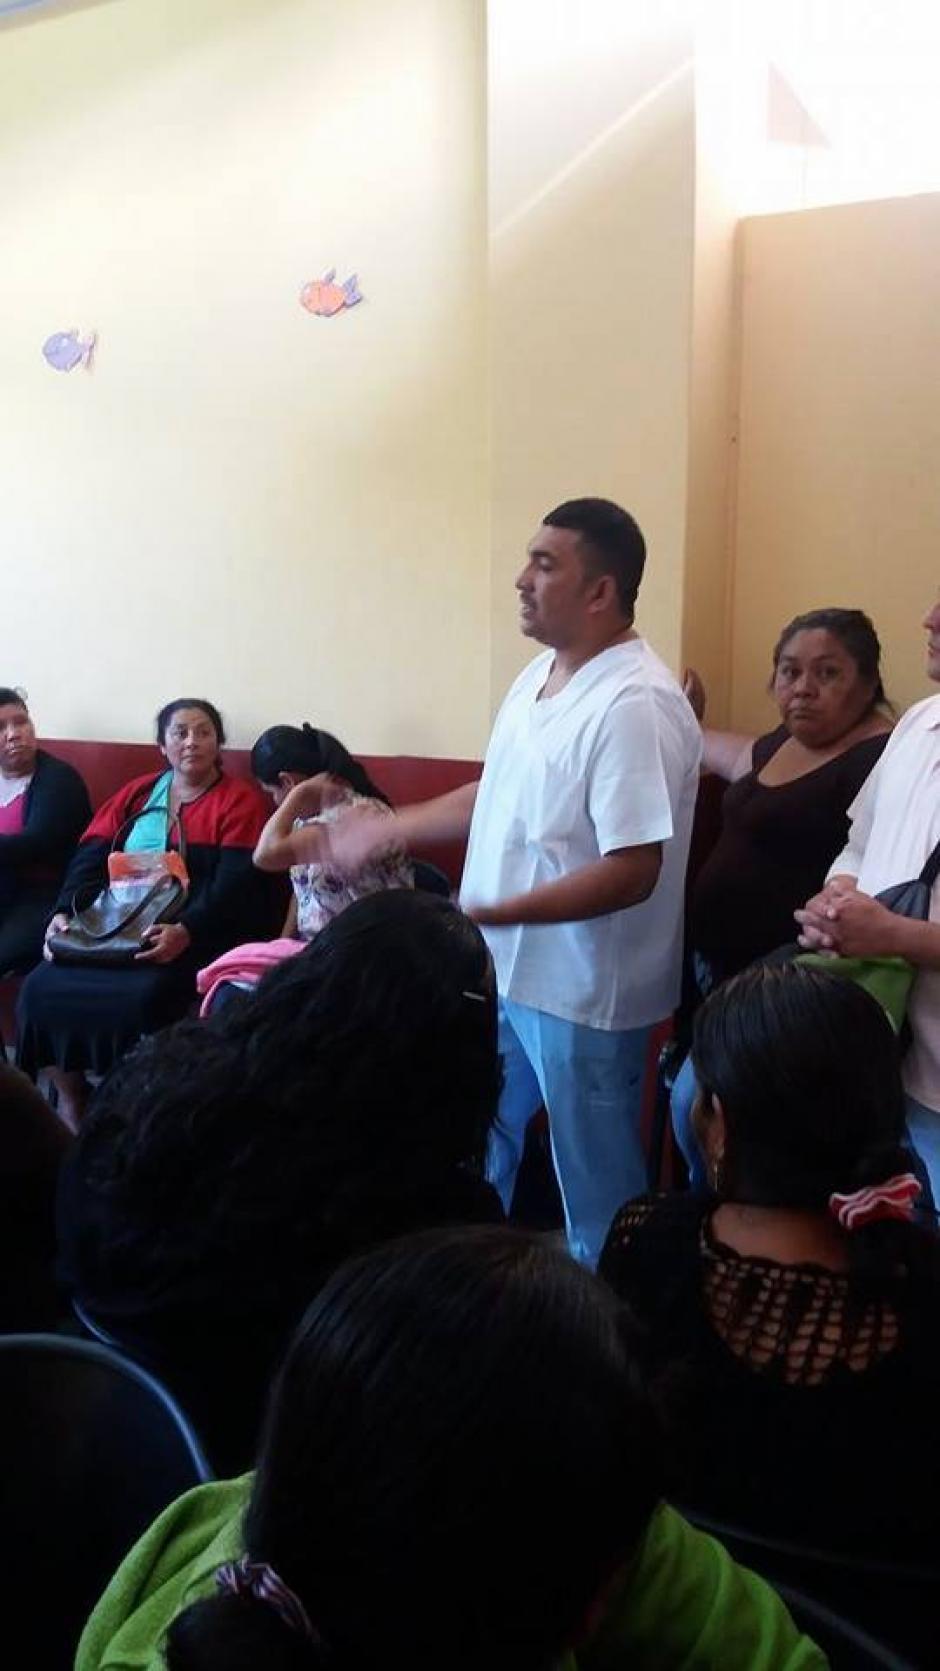 Pacientes del Hospital Nacional de Amatitlán a la espera de ser atendidos, la consulta externa del nosocomio se encuentra cerrada por falta de insumos. (Foto:Pampichi News Amatitlán)